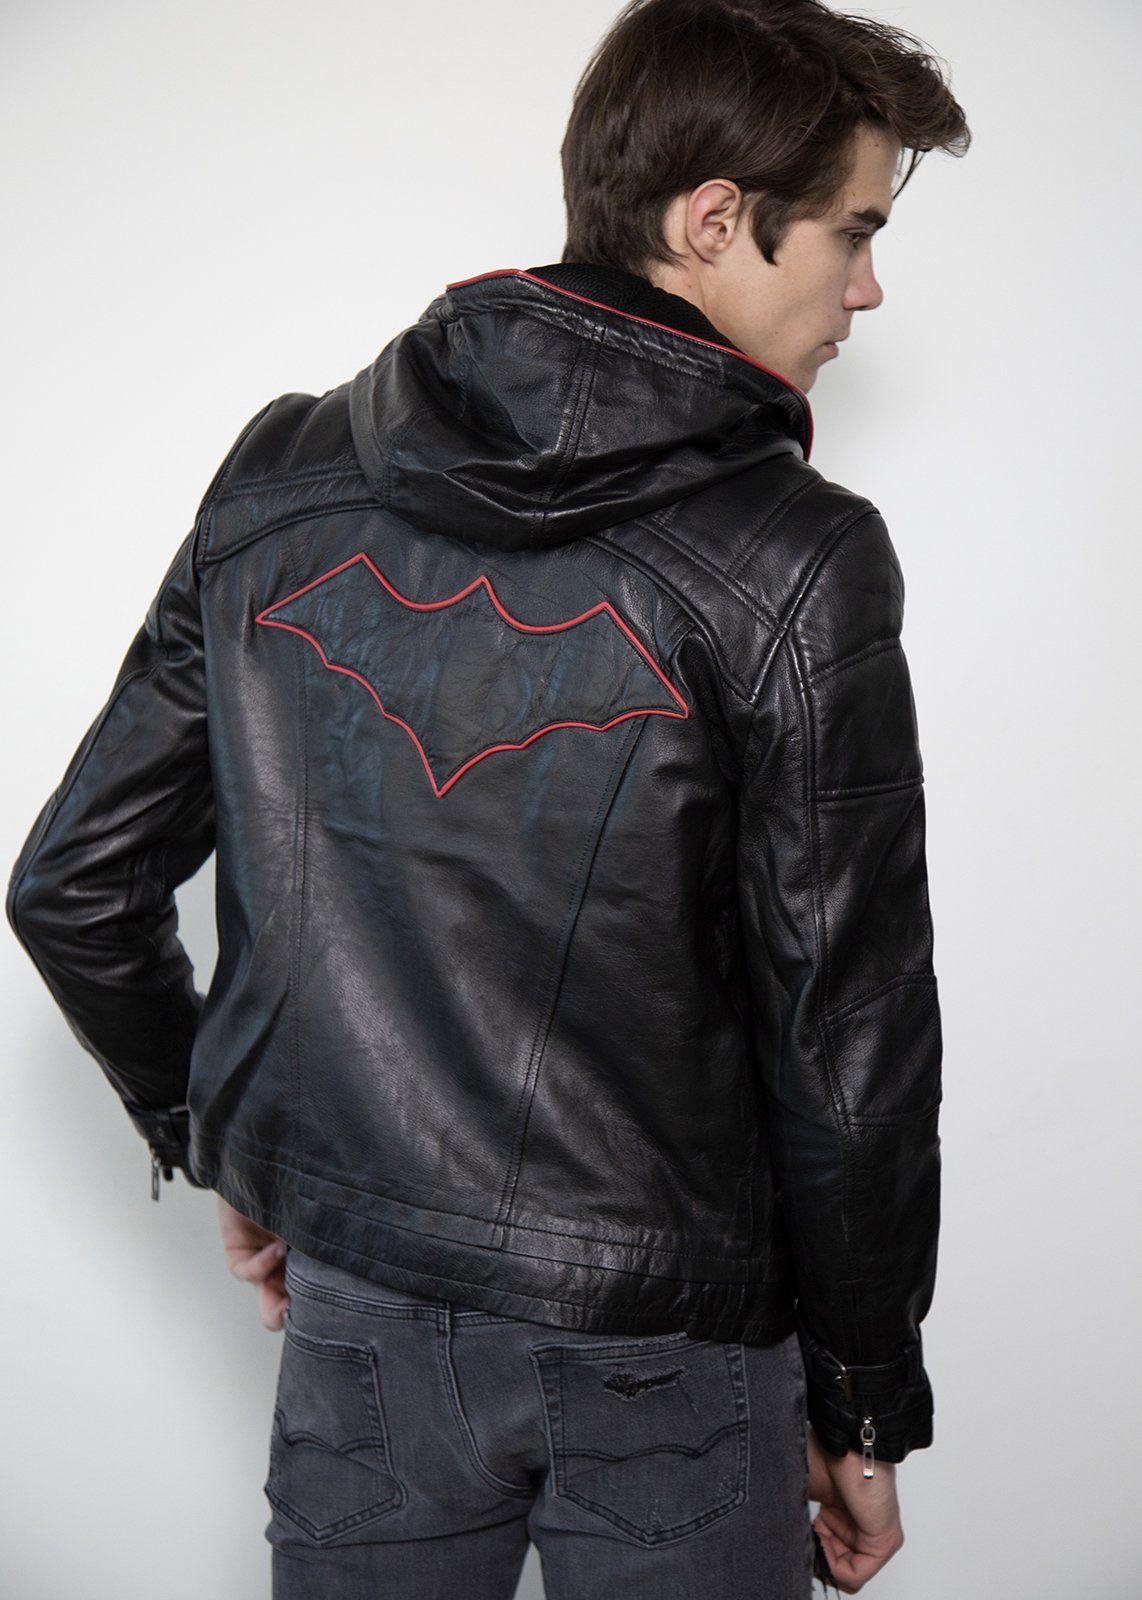 Mens Black Red Hood Leather Jacket Limited Edition In 2021 Leather Jacket With Hood Leather Jacket Blue Leather Jacket [ 1600 x 1142 Pixel ]